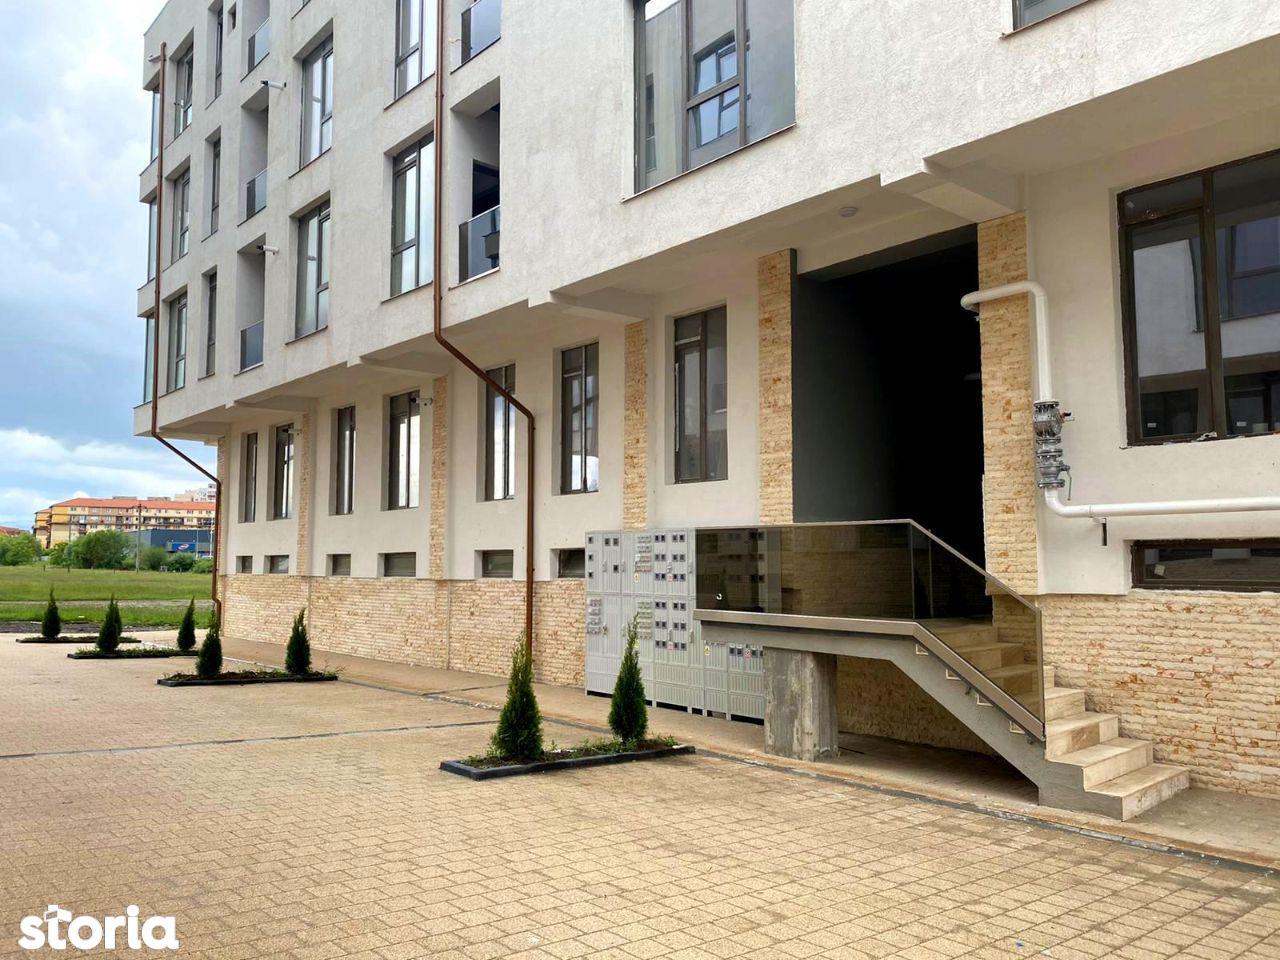 Proprietar vand apartament 3 camere Doamna Stanca colt cu str Ostirii